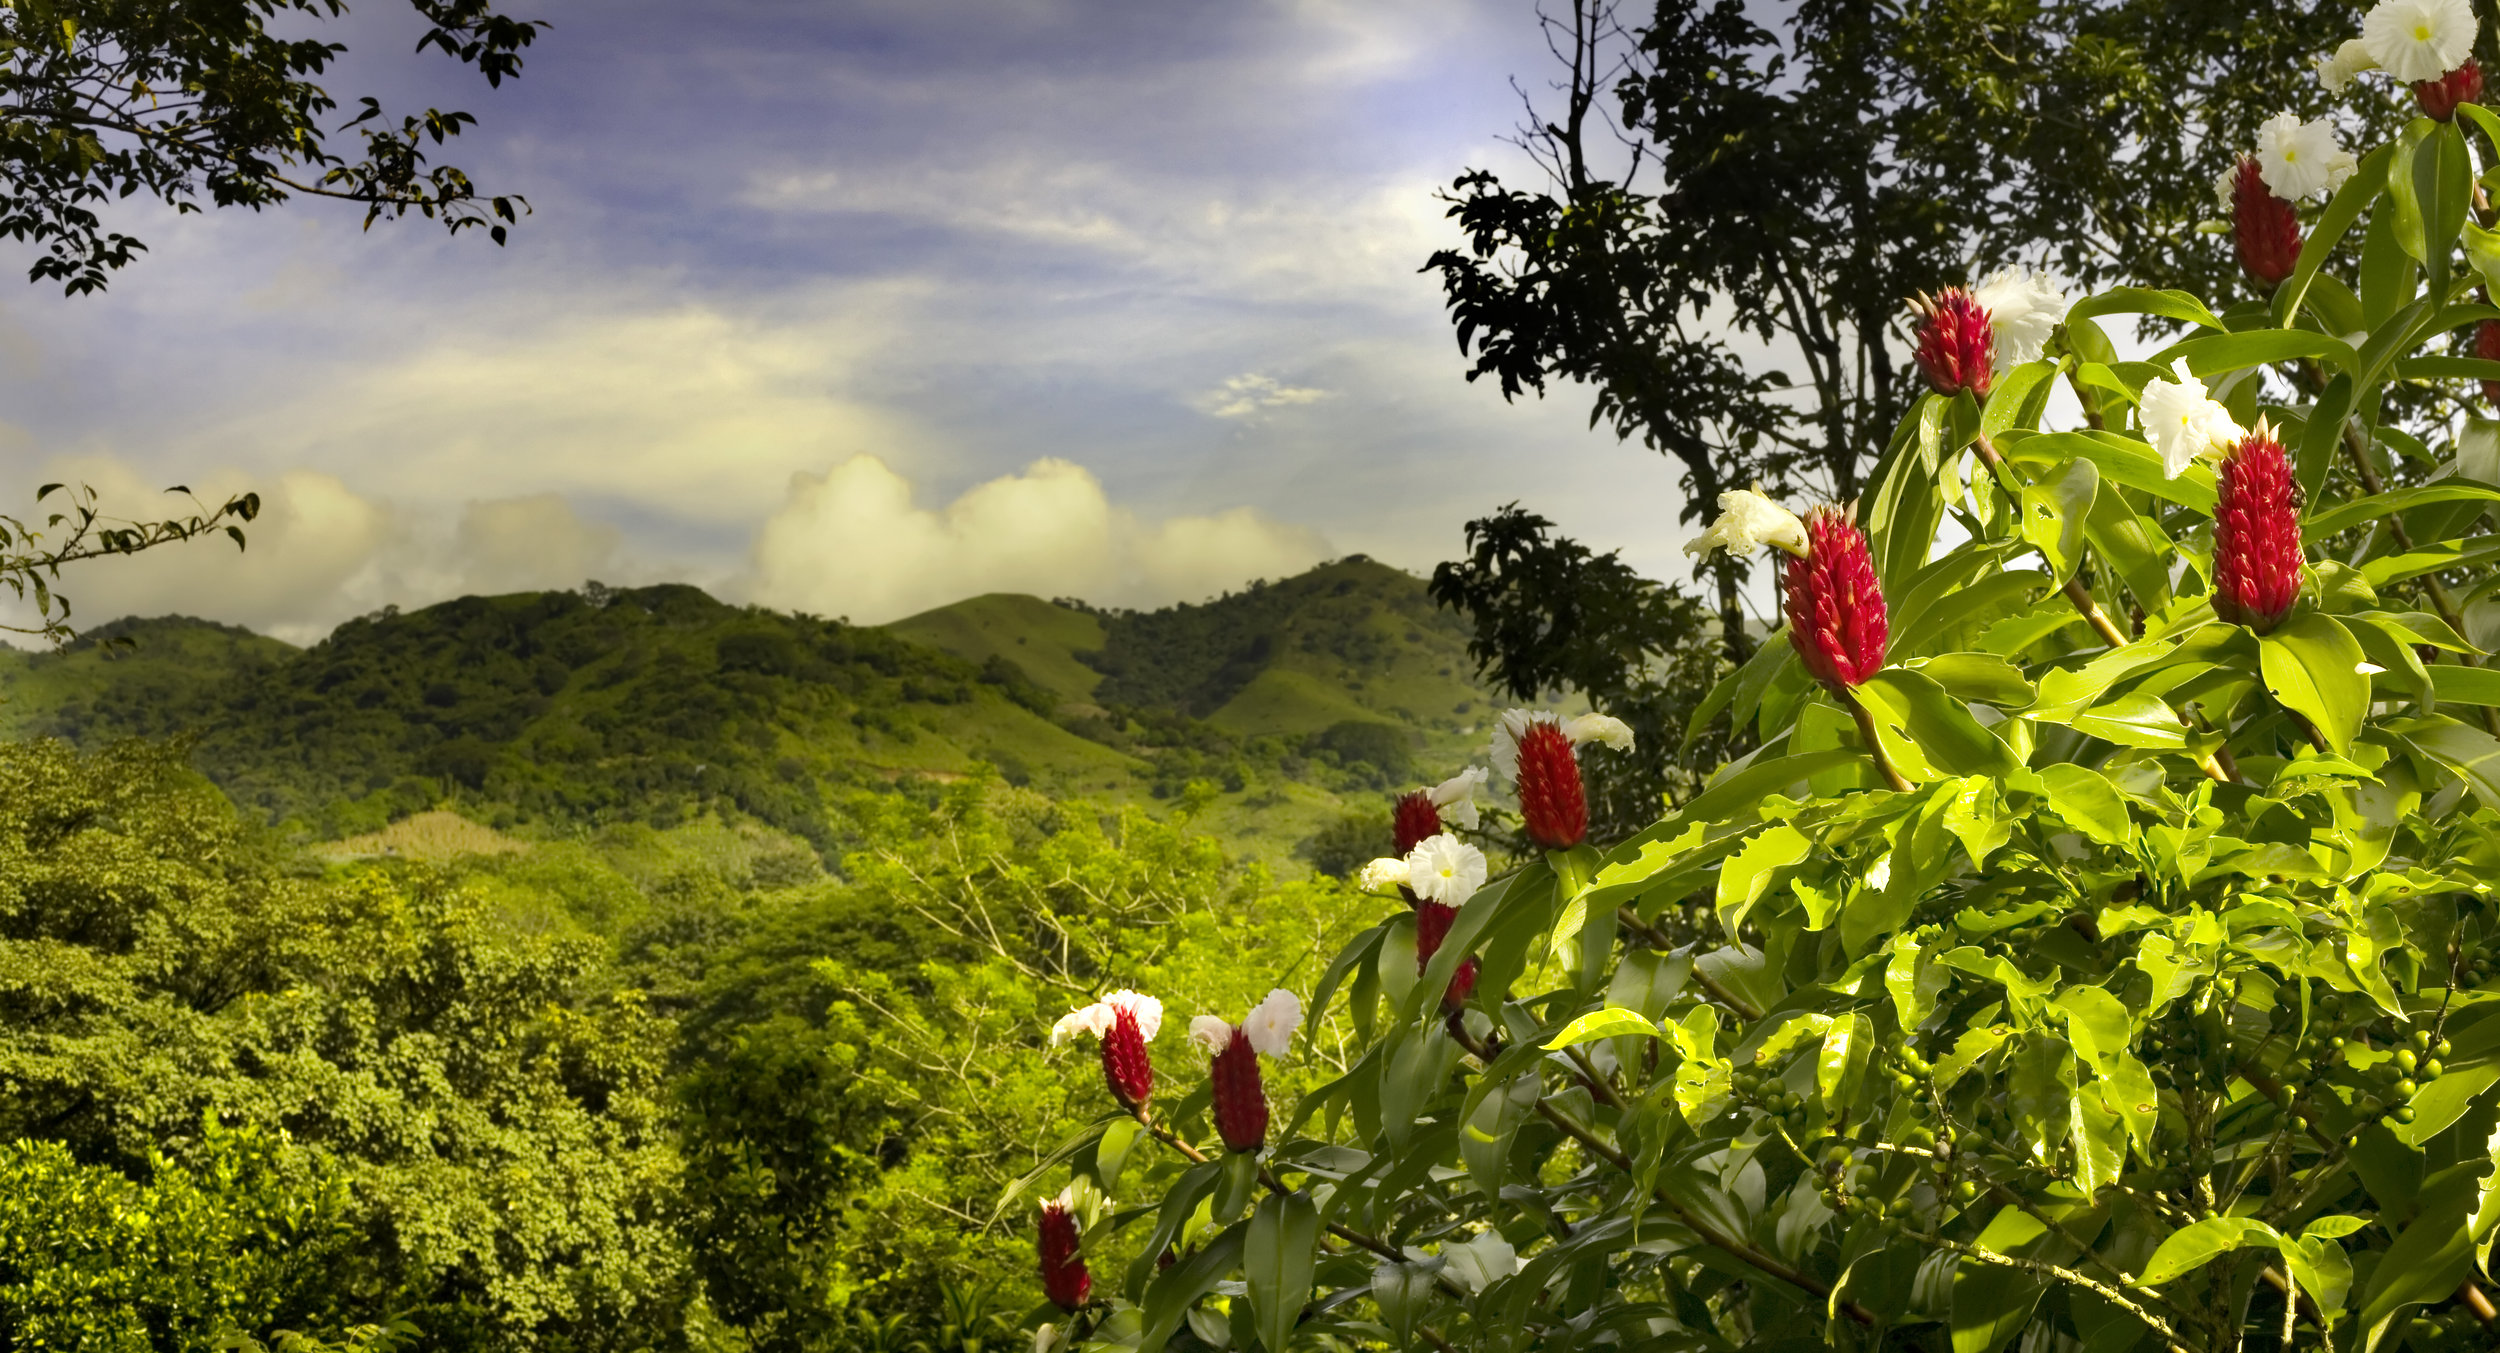 costarica_iStock-144368294.jpg